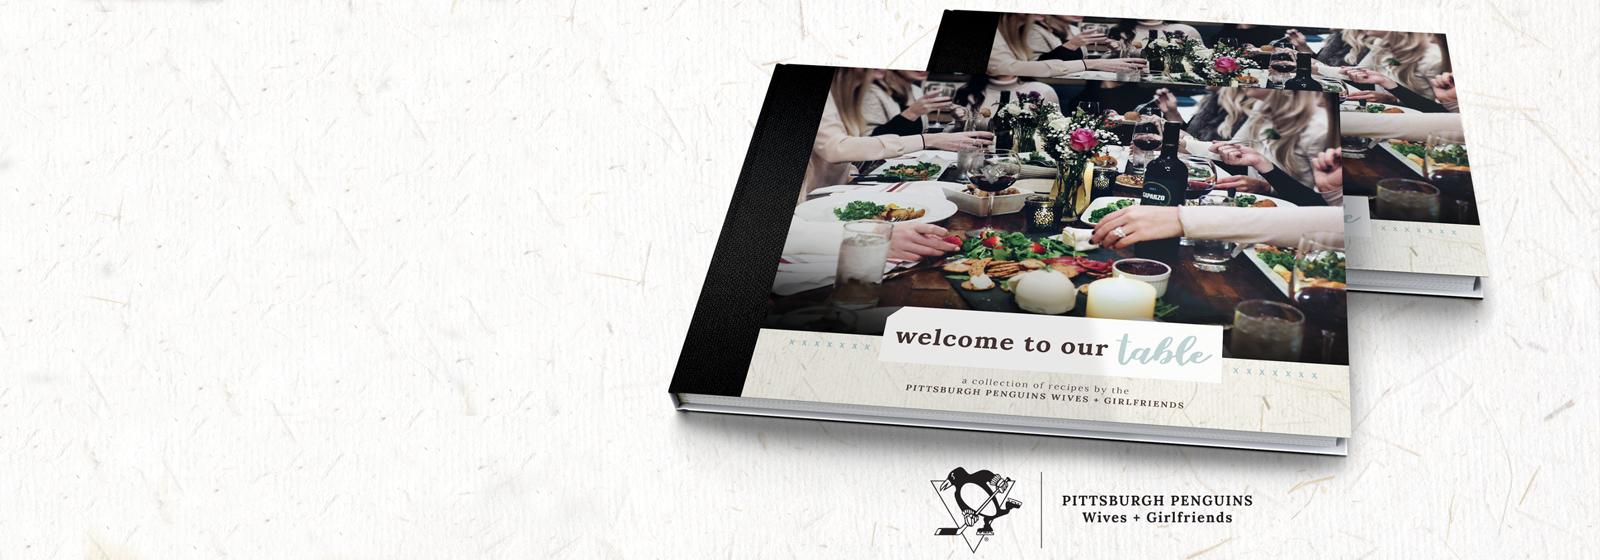 Pittsburgh Penguins Cookbook